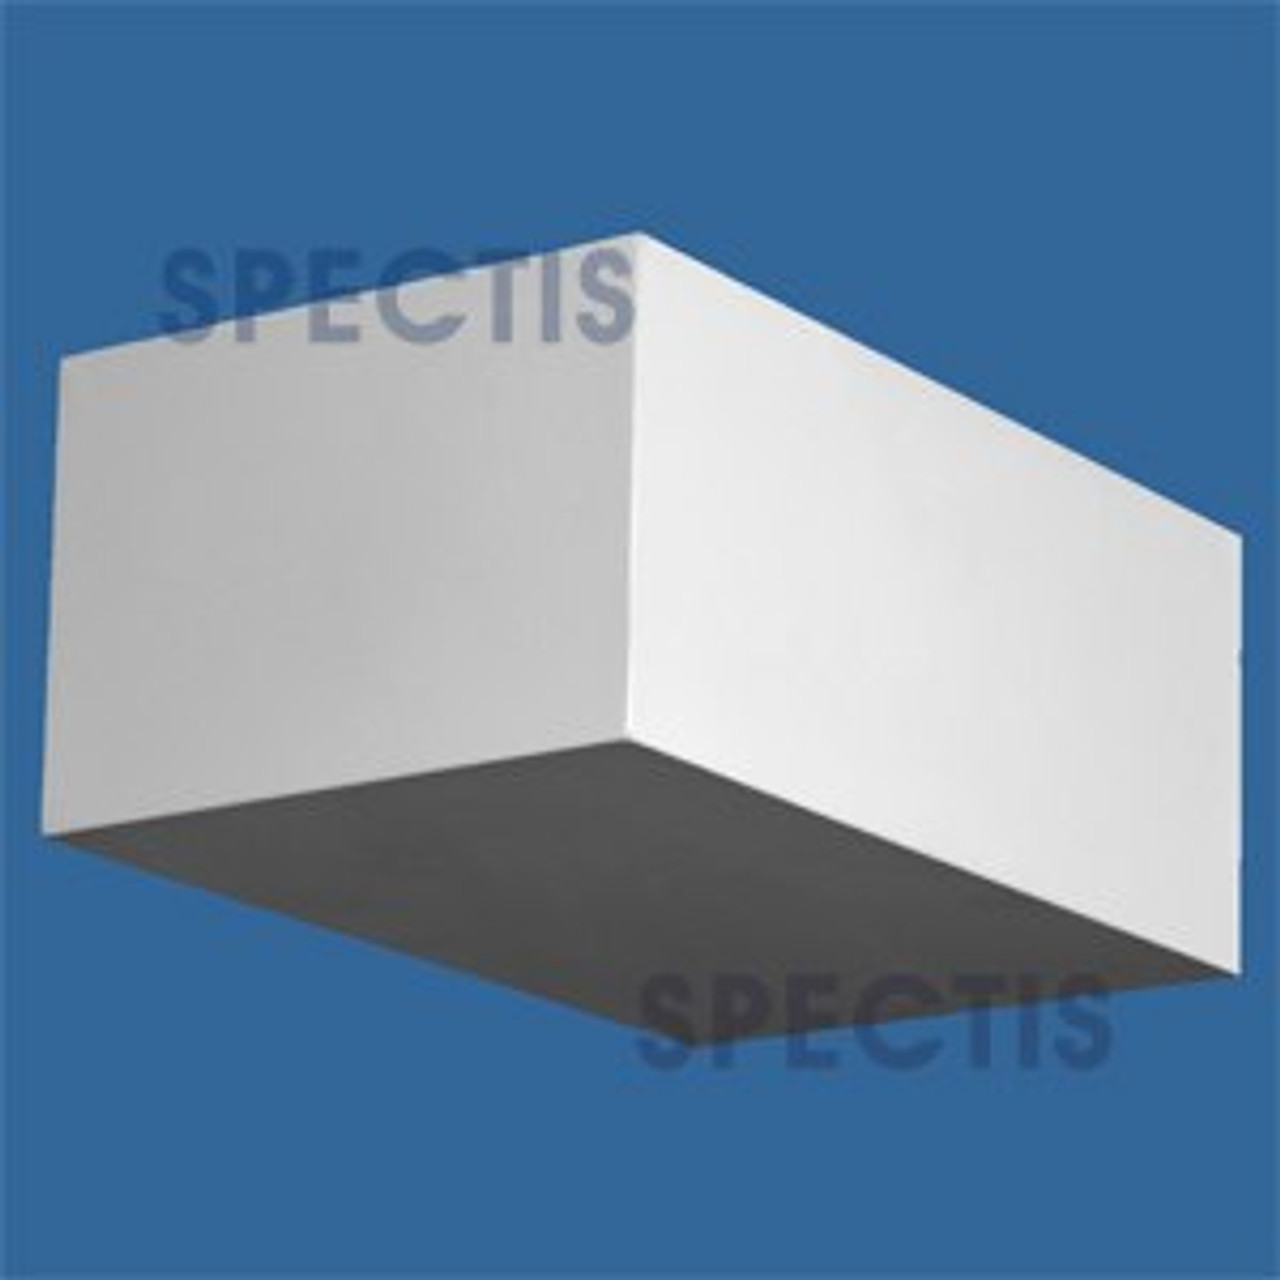 "BL2861 Corbel Block or Eave Bracket 6.5""W x 4.5""H x 10.2"" P"